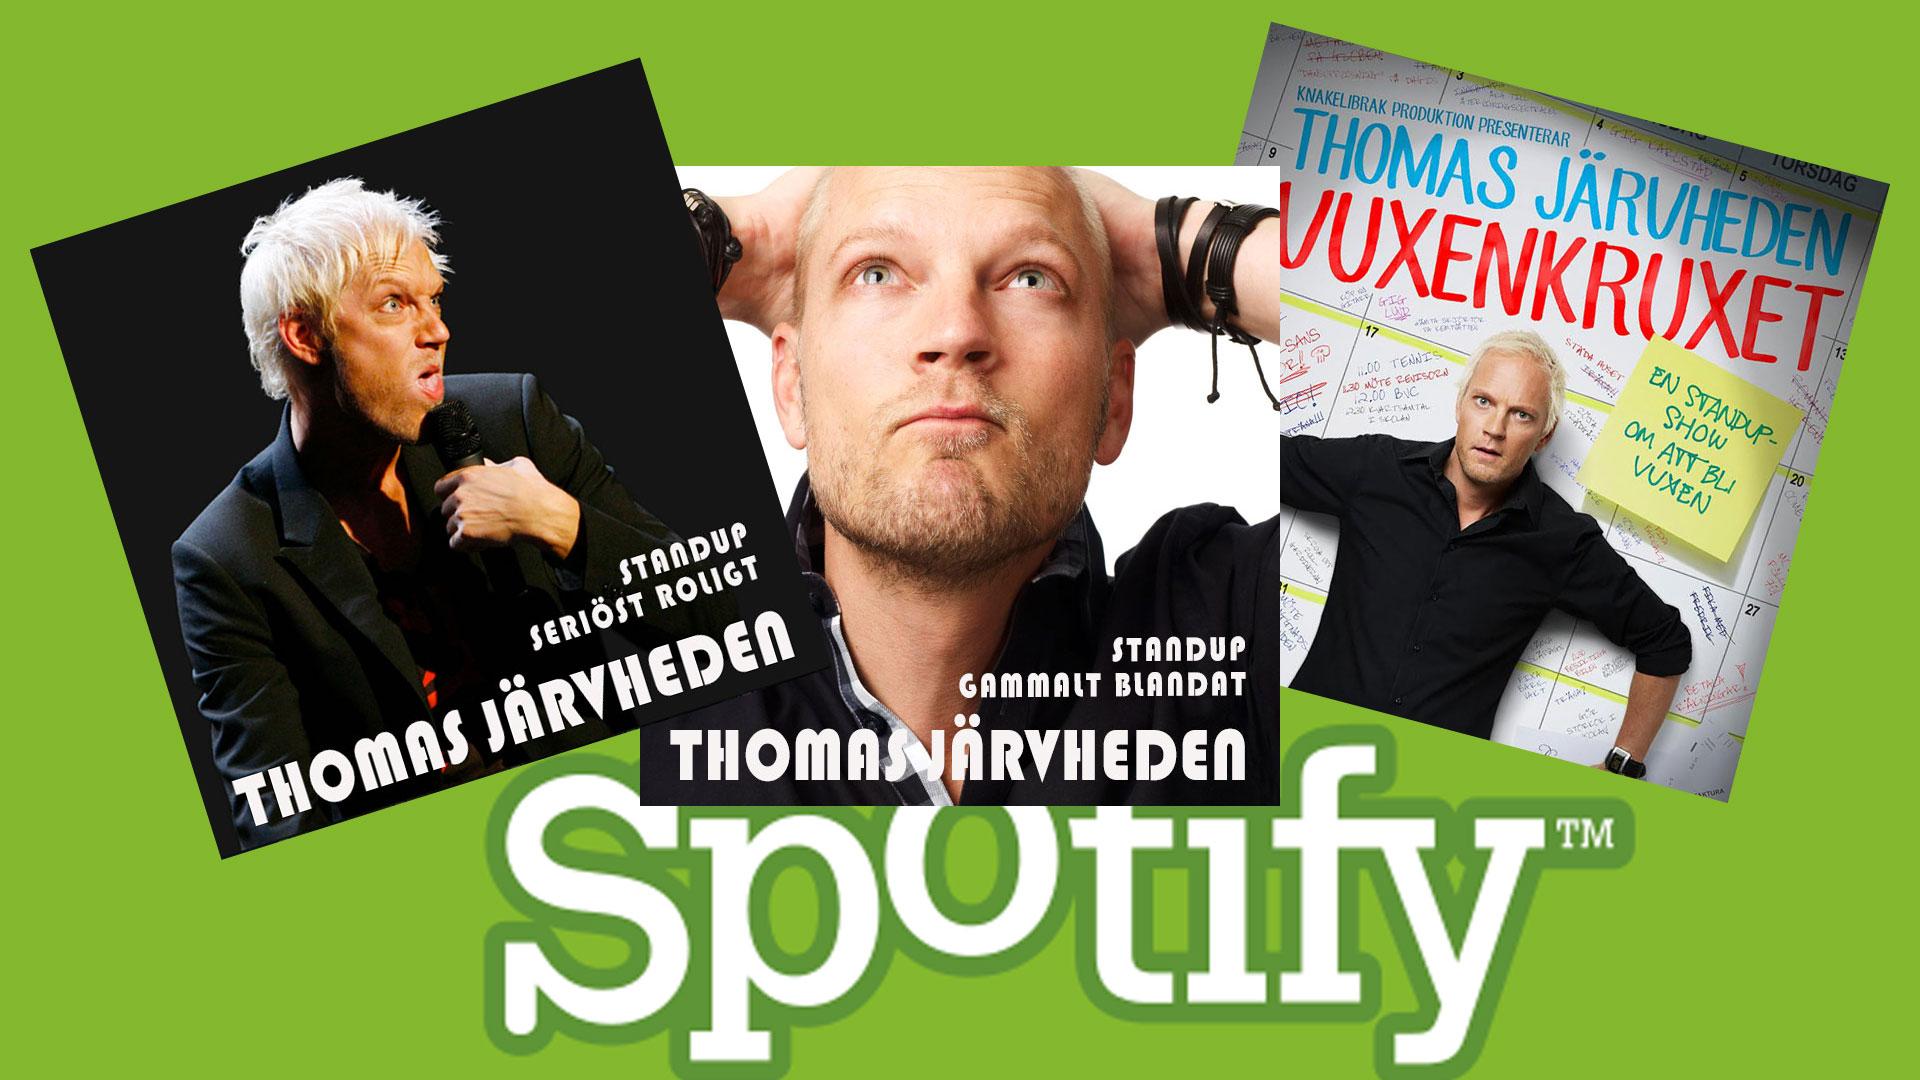 SpotifyCovers for Thomas Järvheden